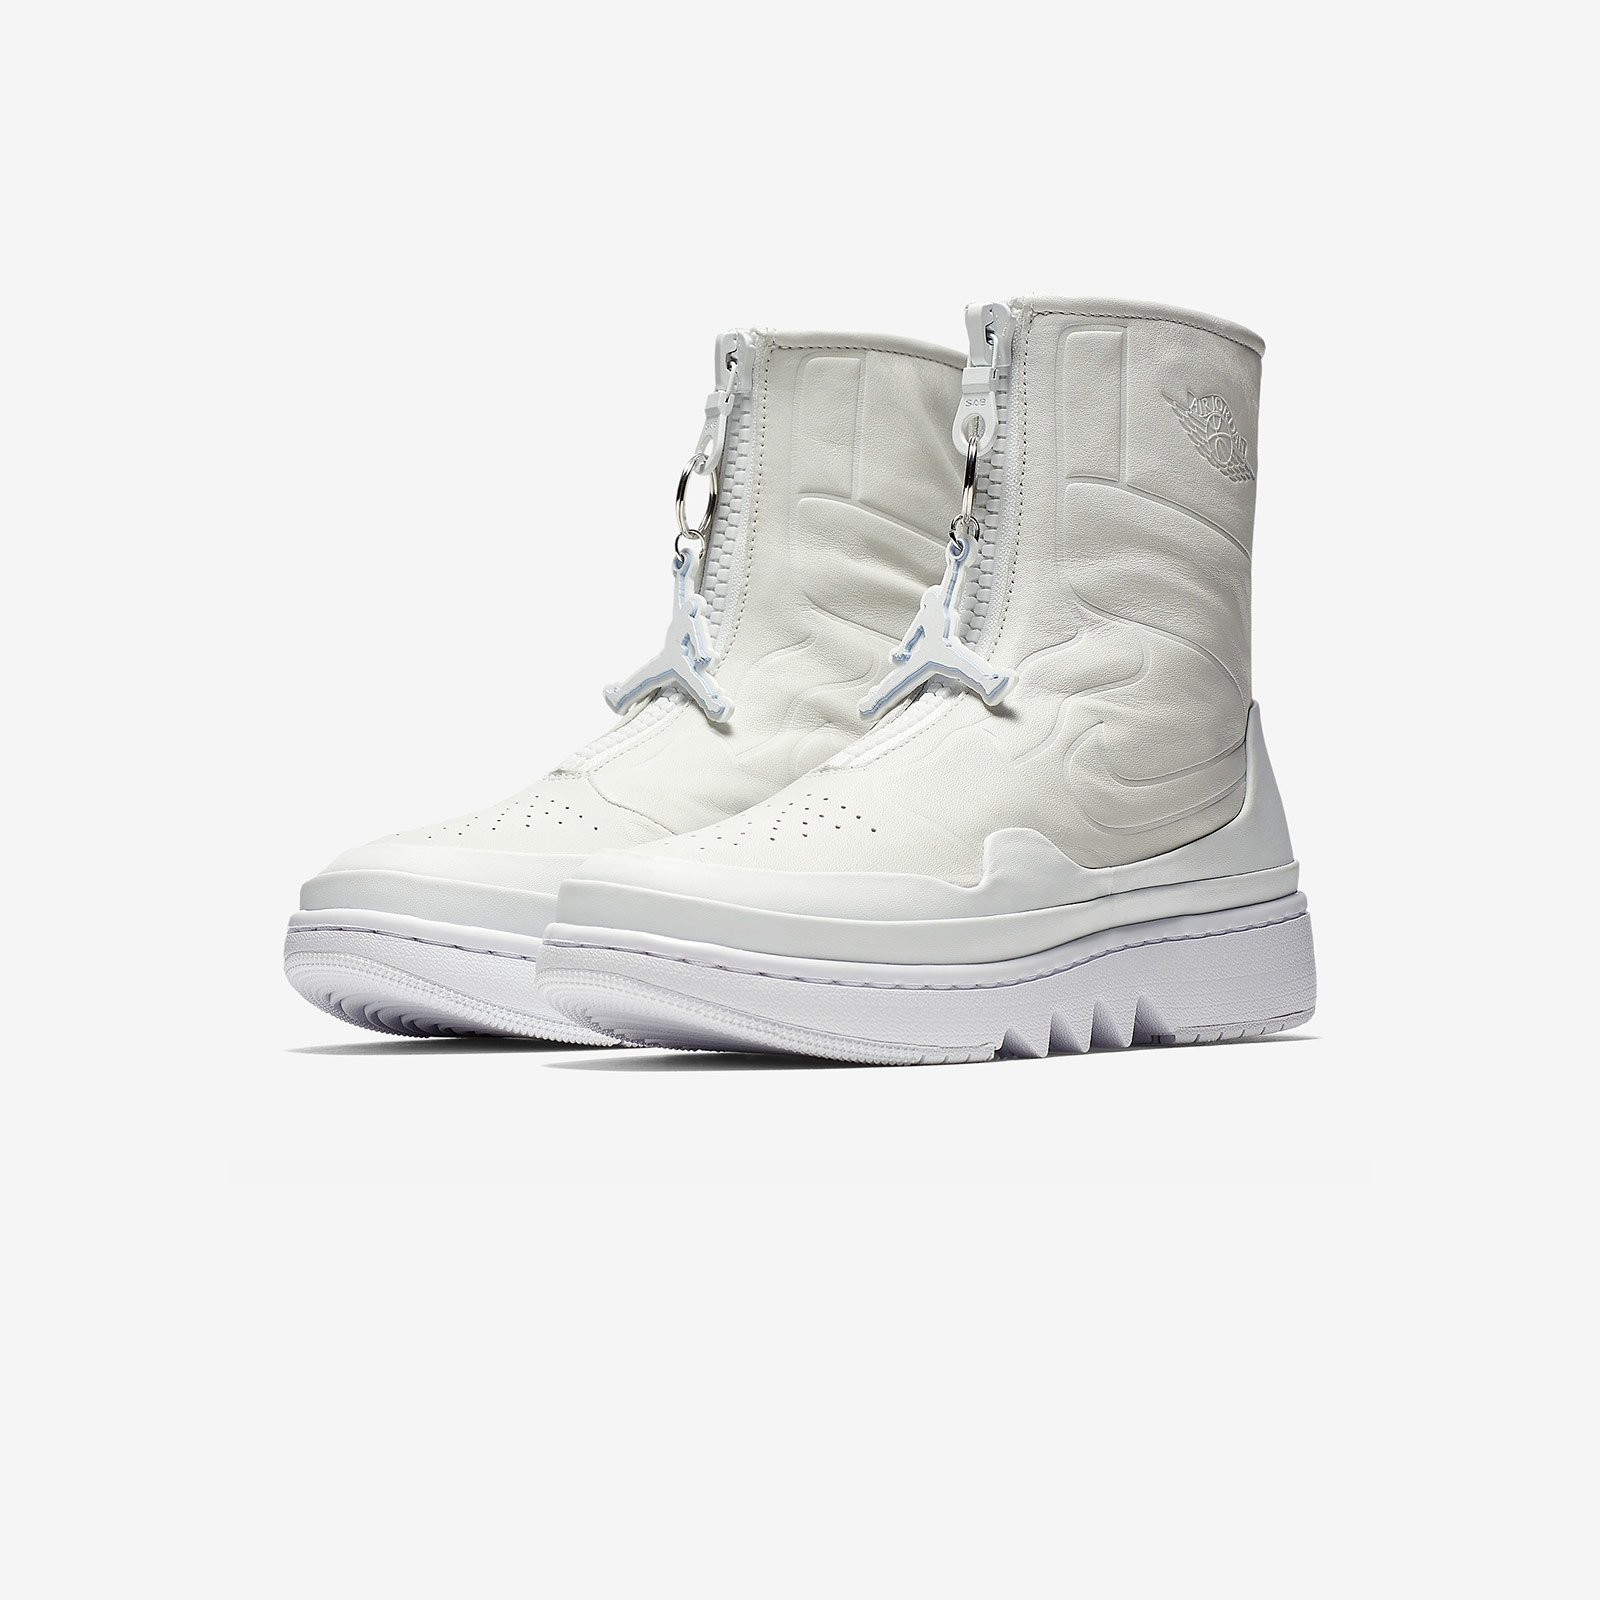 best sneakers 1de69 edbfb Jordan Brand Air Jordan 1 Jester XX THE 1, REIMAGINED - Ao1265-100 ...